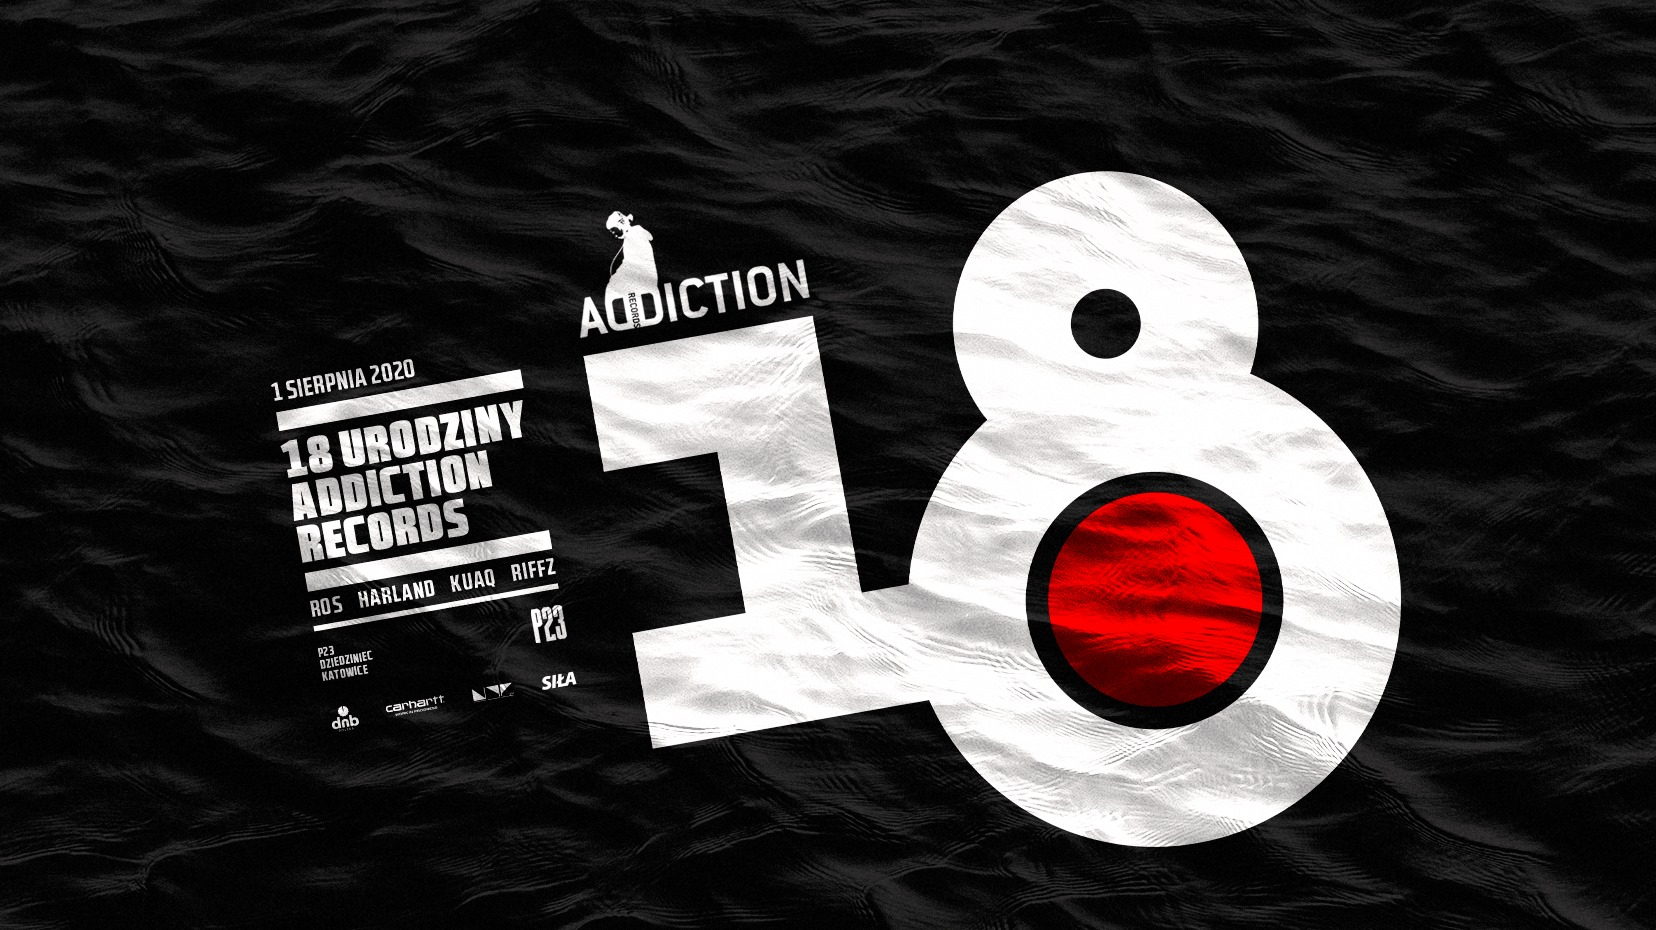 18 addiction records urodziny katowice p23